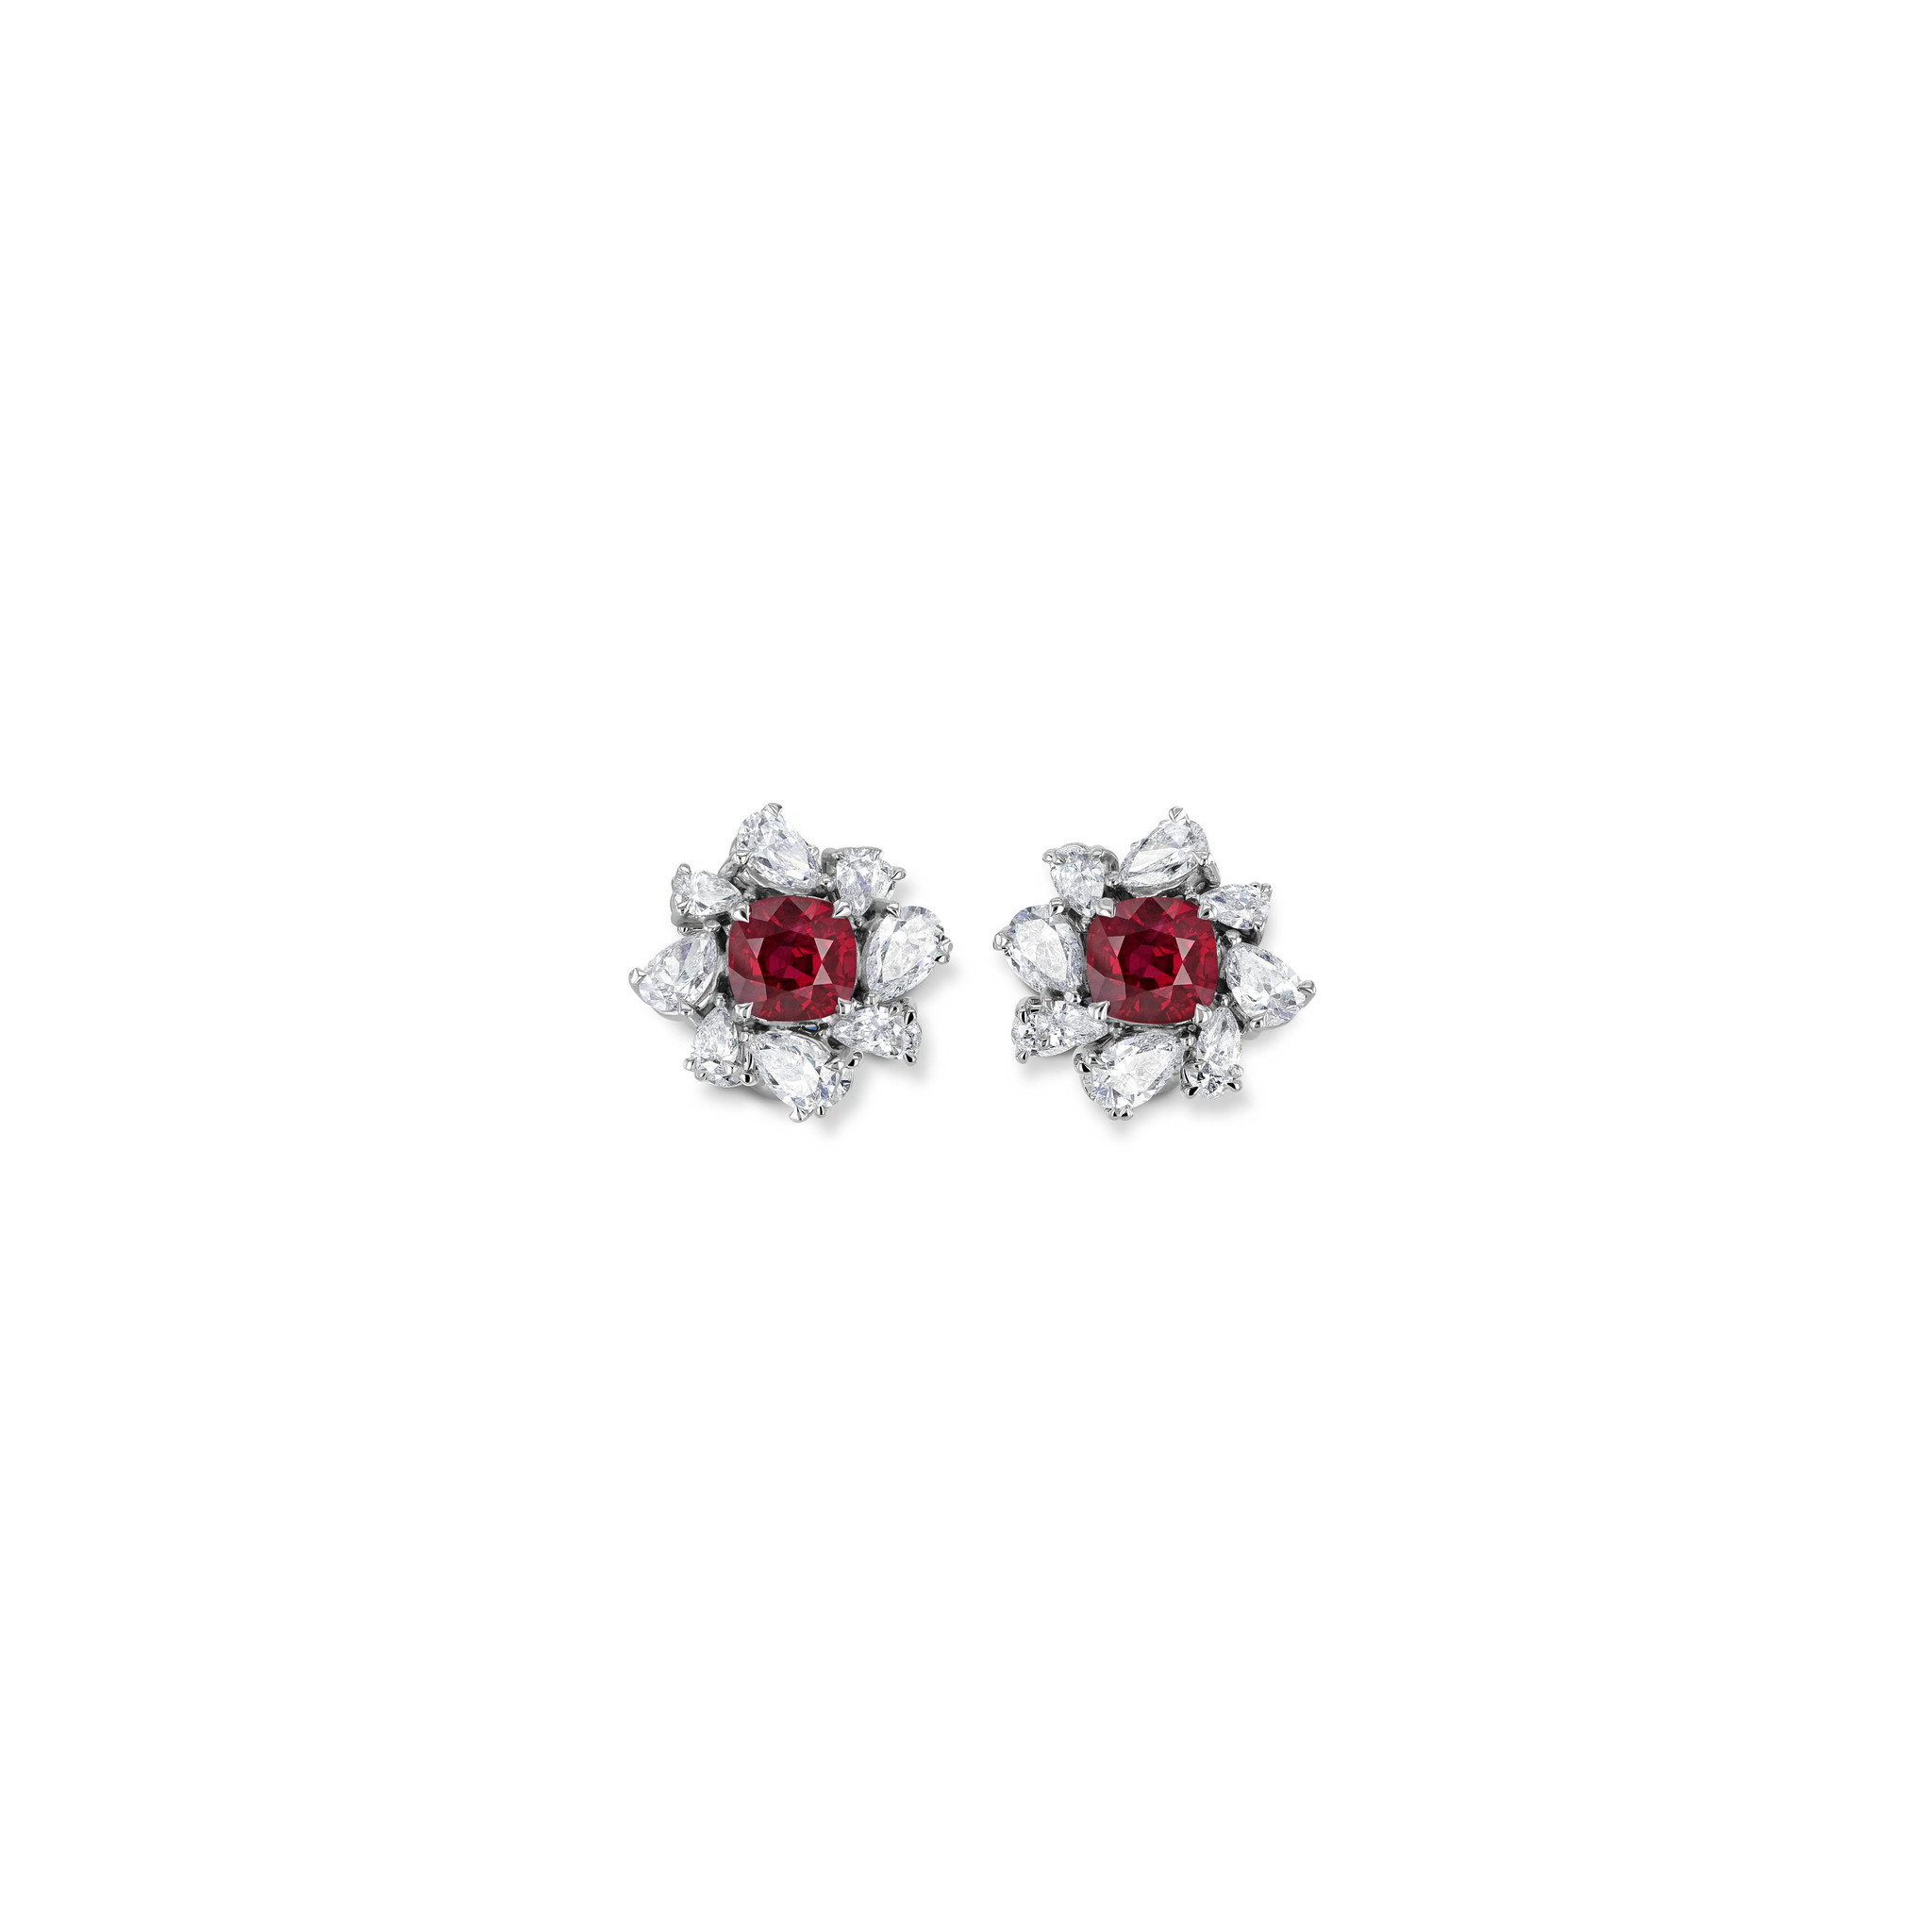 Ohrringe mit Rubinen